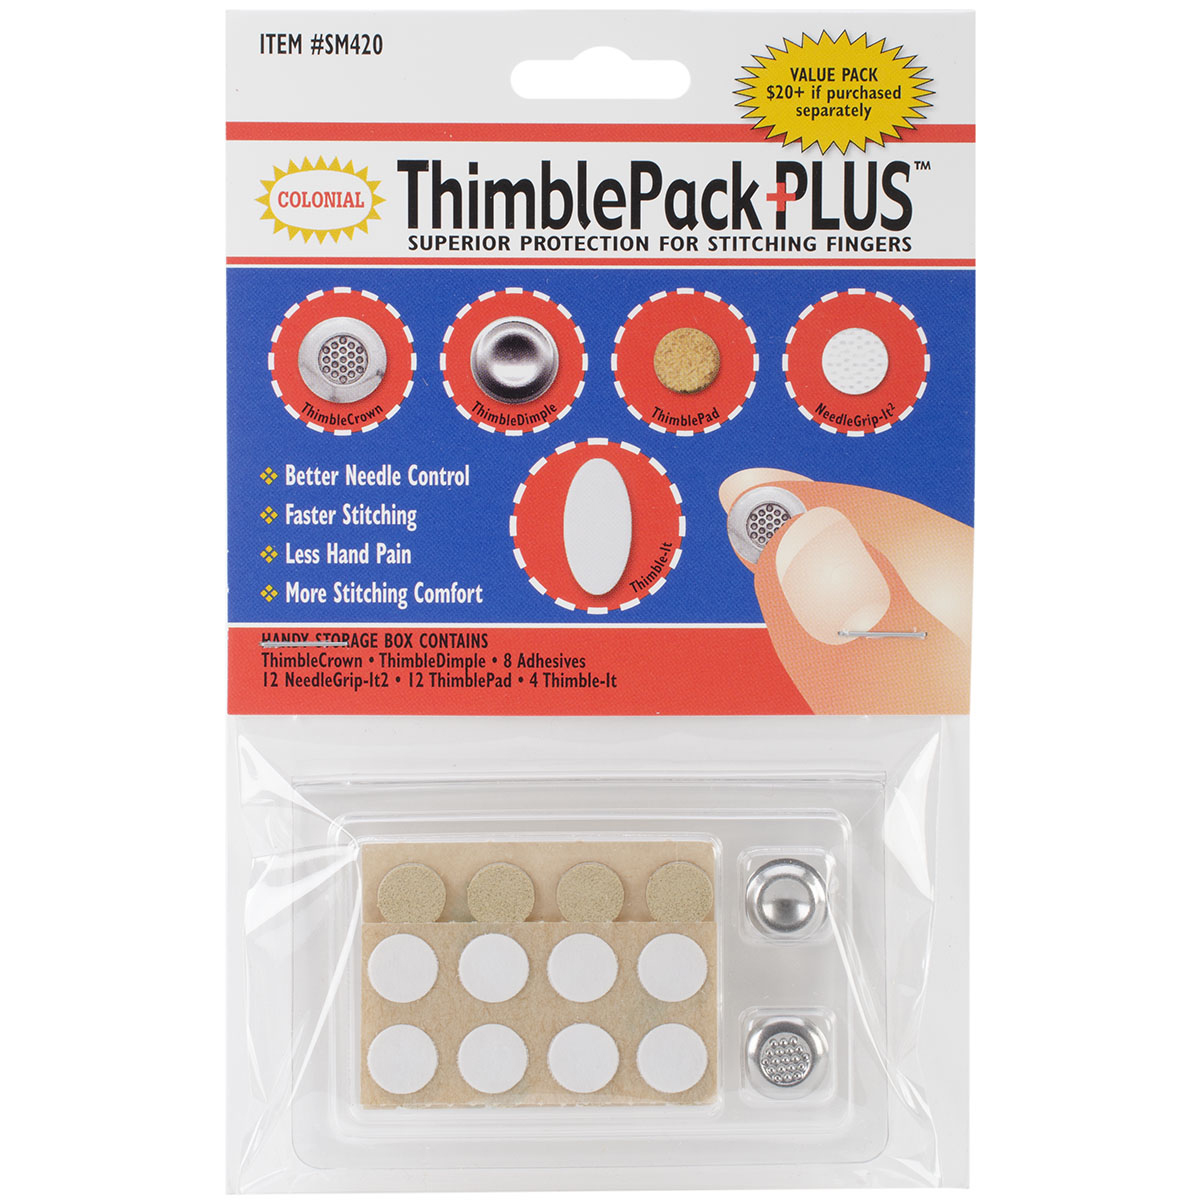 Colonial ThimblePack Plus-